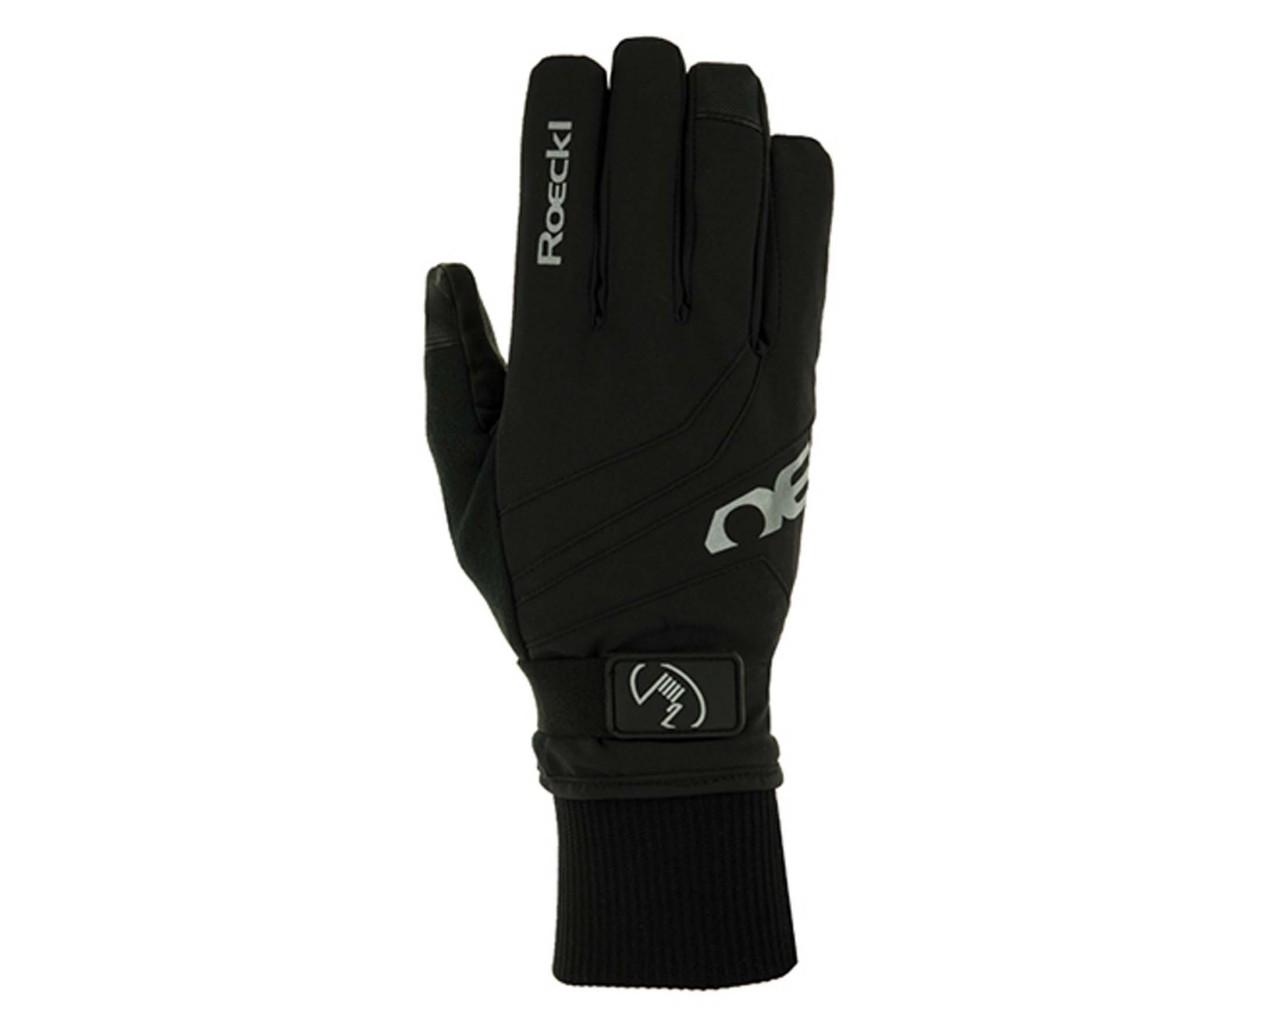 ROECKL Rocca GTX Winter Bike Handschuhe langfinger | black